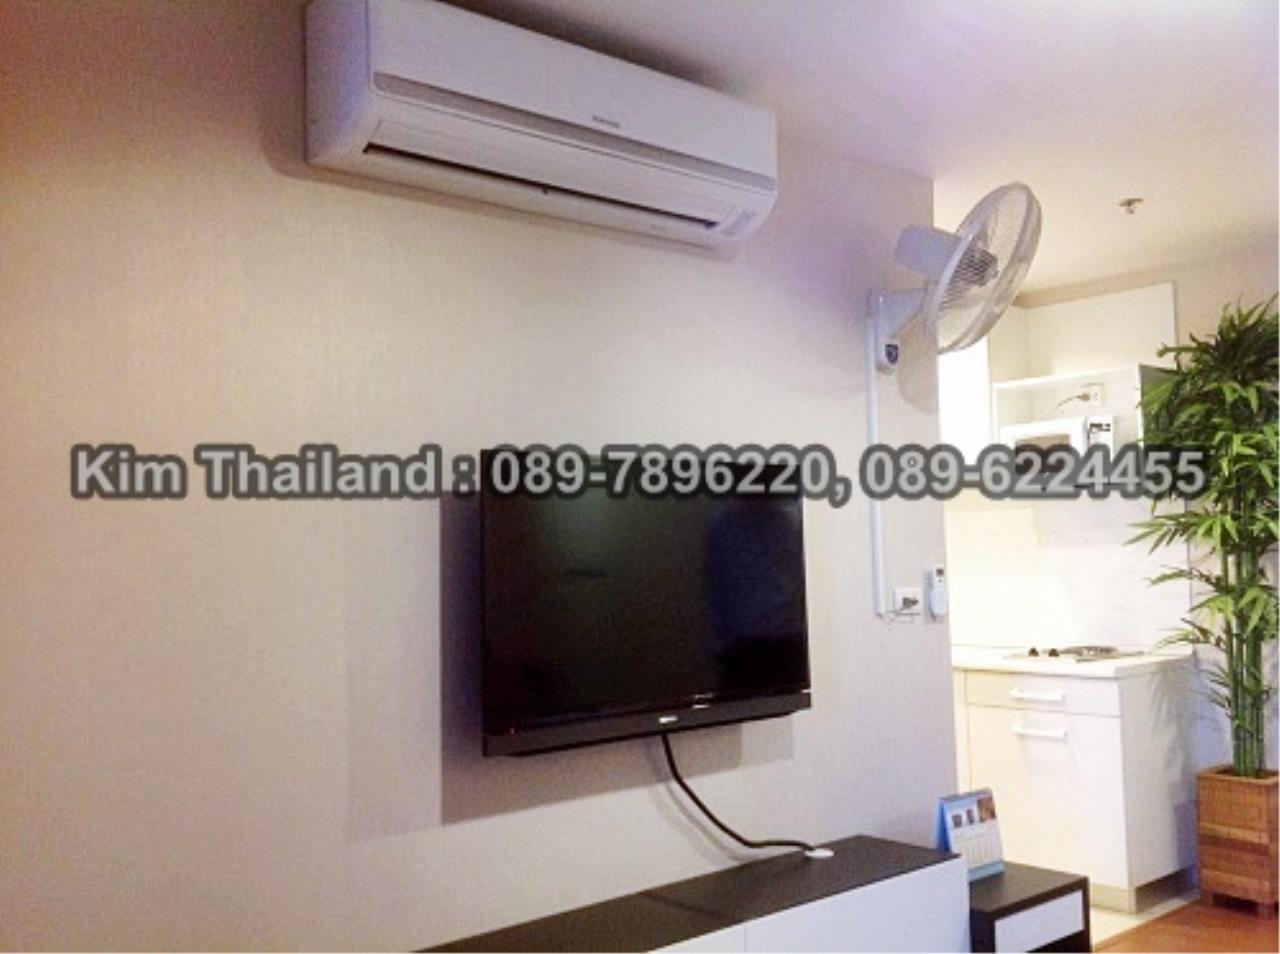 BKKcondorental Agency's For rent, Condo Belle Grand Rama 9.  Building C2, 1Xth floor, Area 48 sq.m.  2